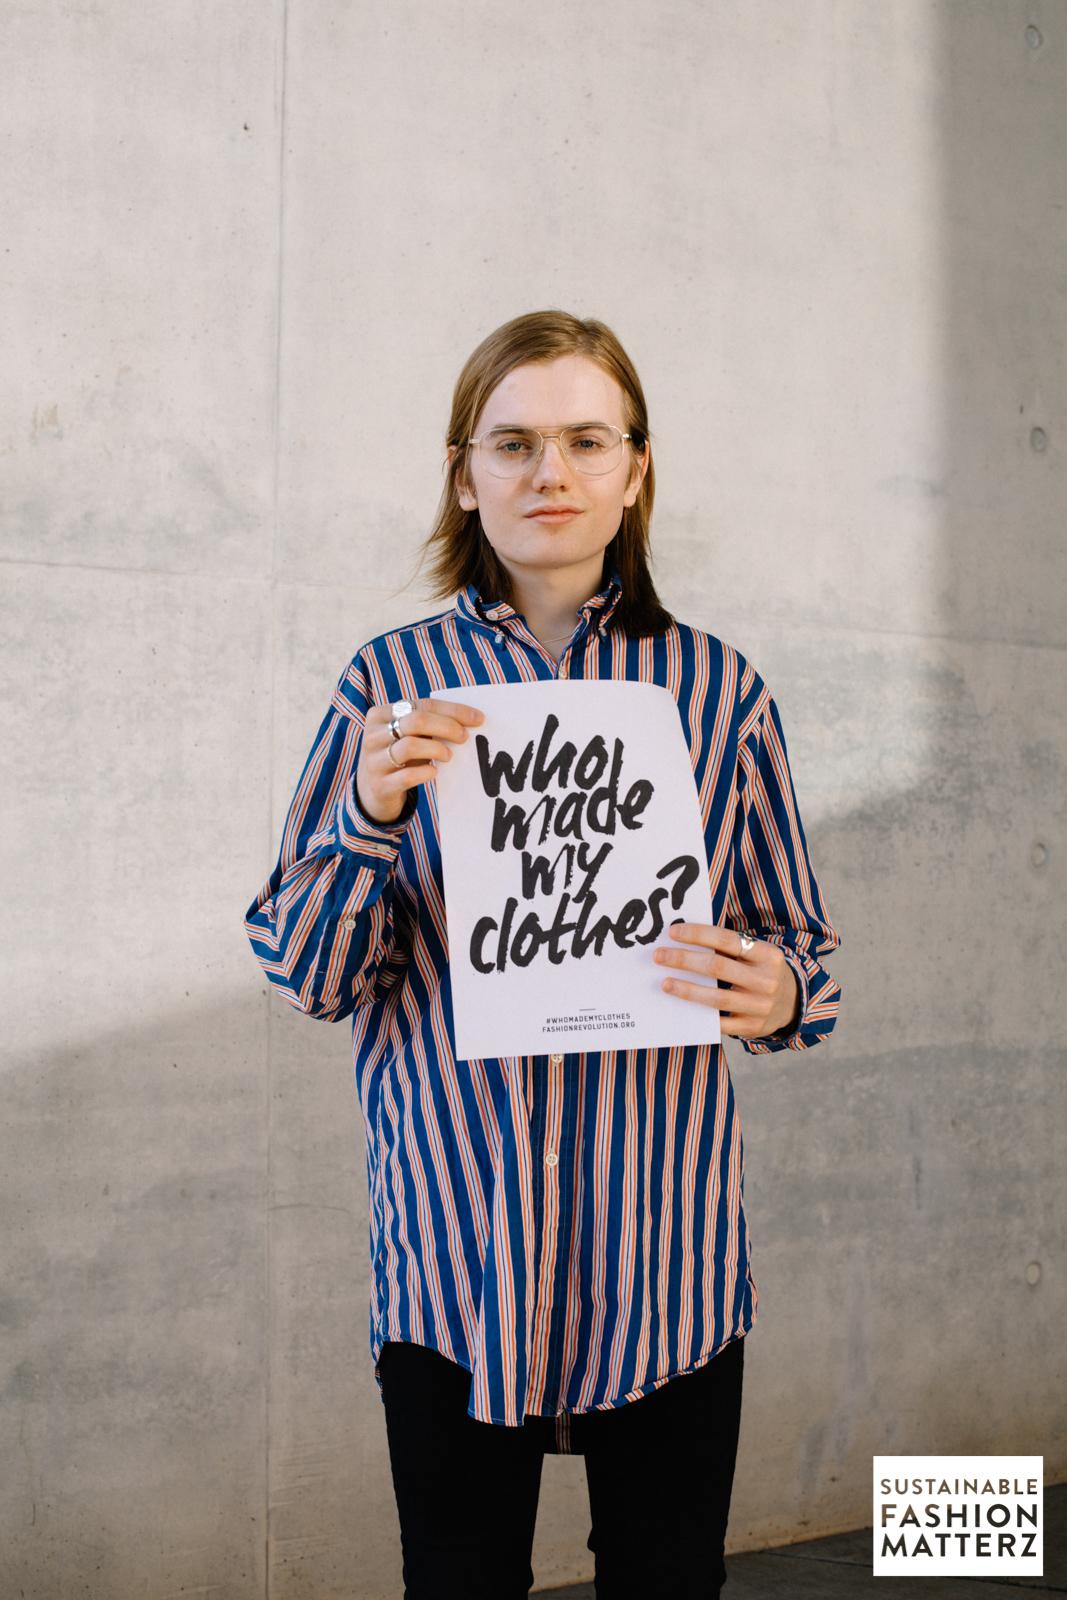 fashion-revolution-by-sustainable-fashion-matterz-108.jpg